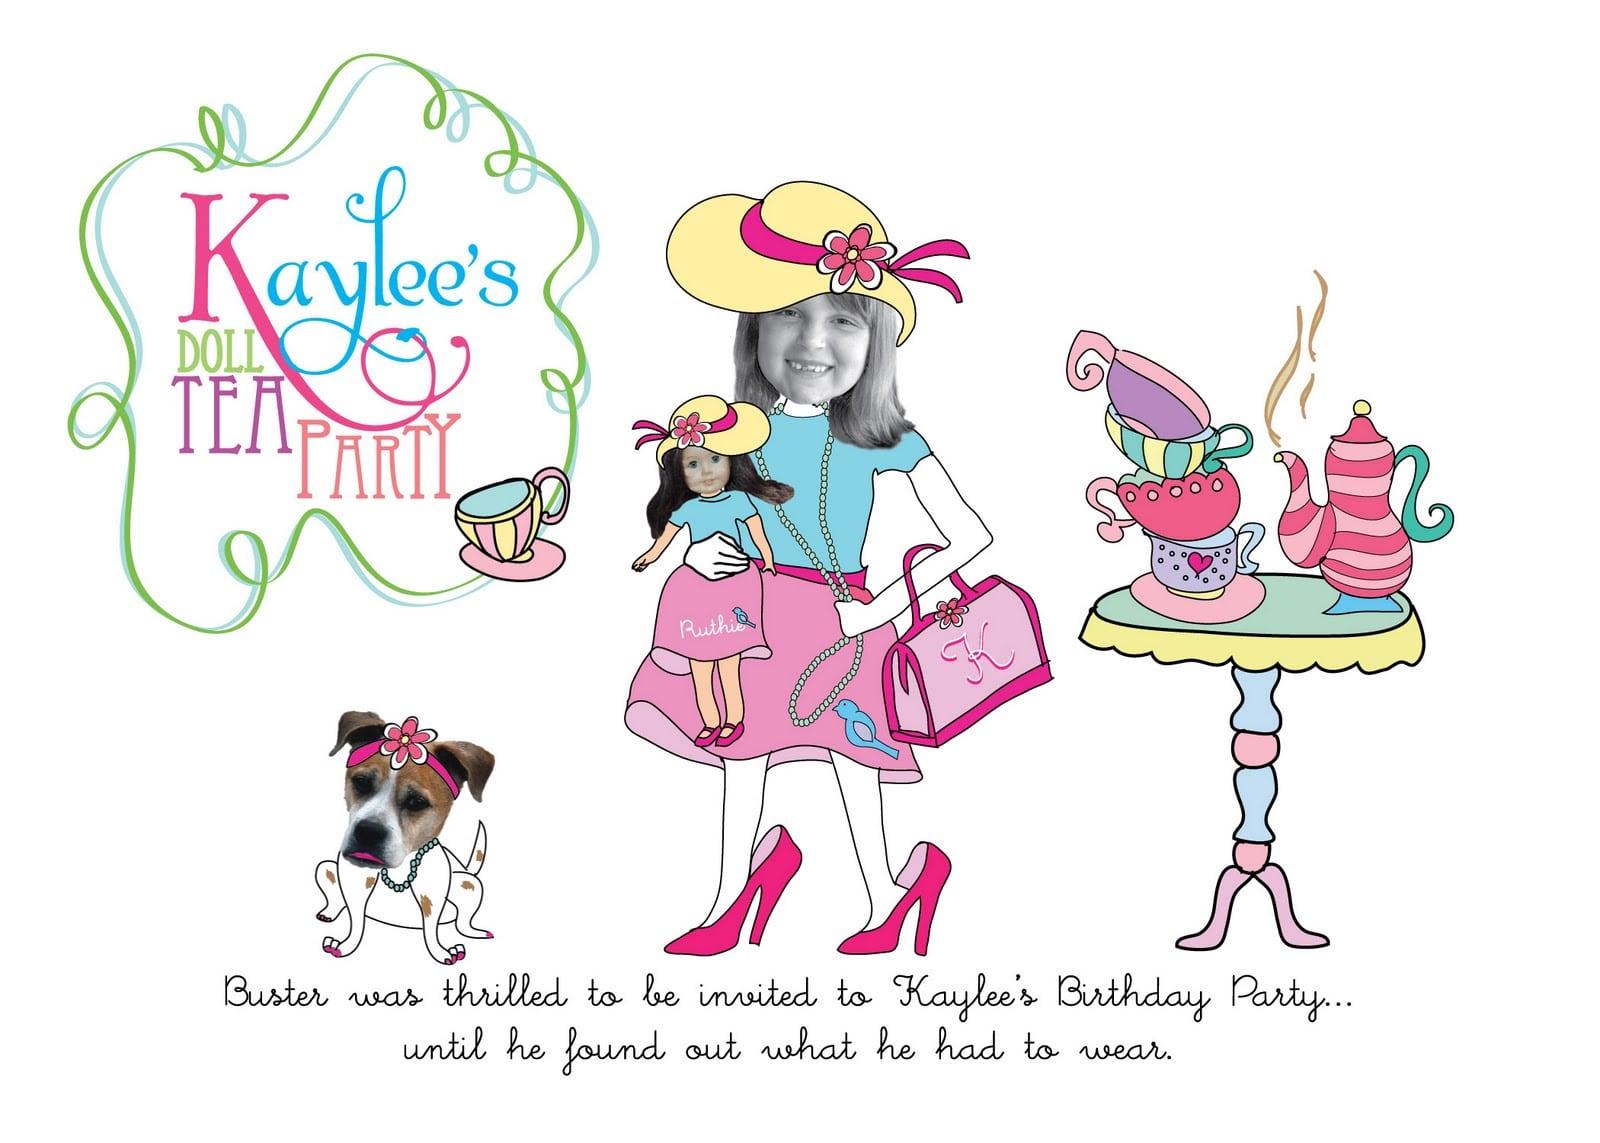 Ladies Tea Party Invitations - Mickey Mouse Invitations Templates